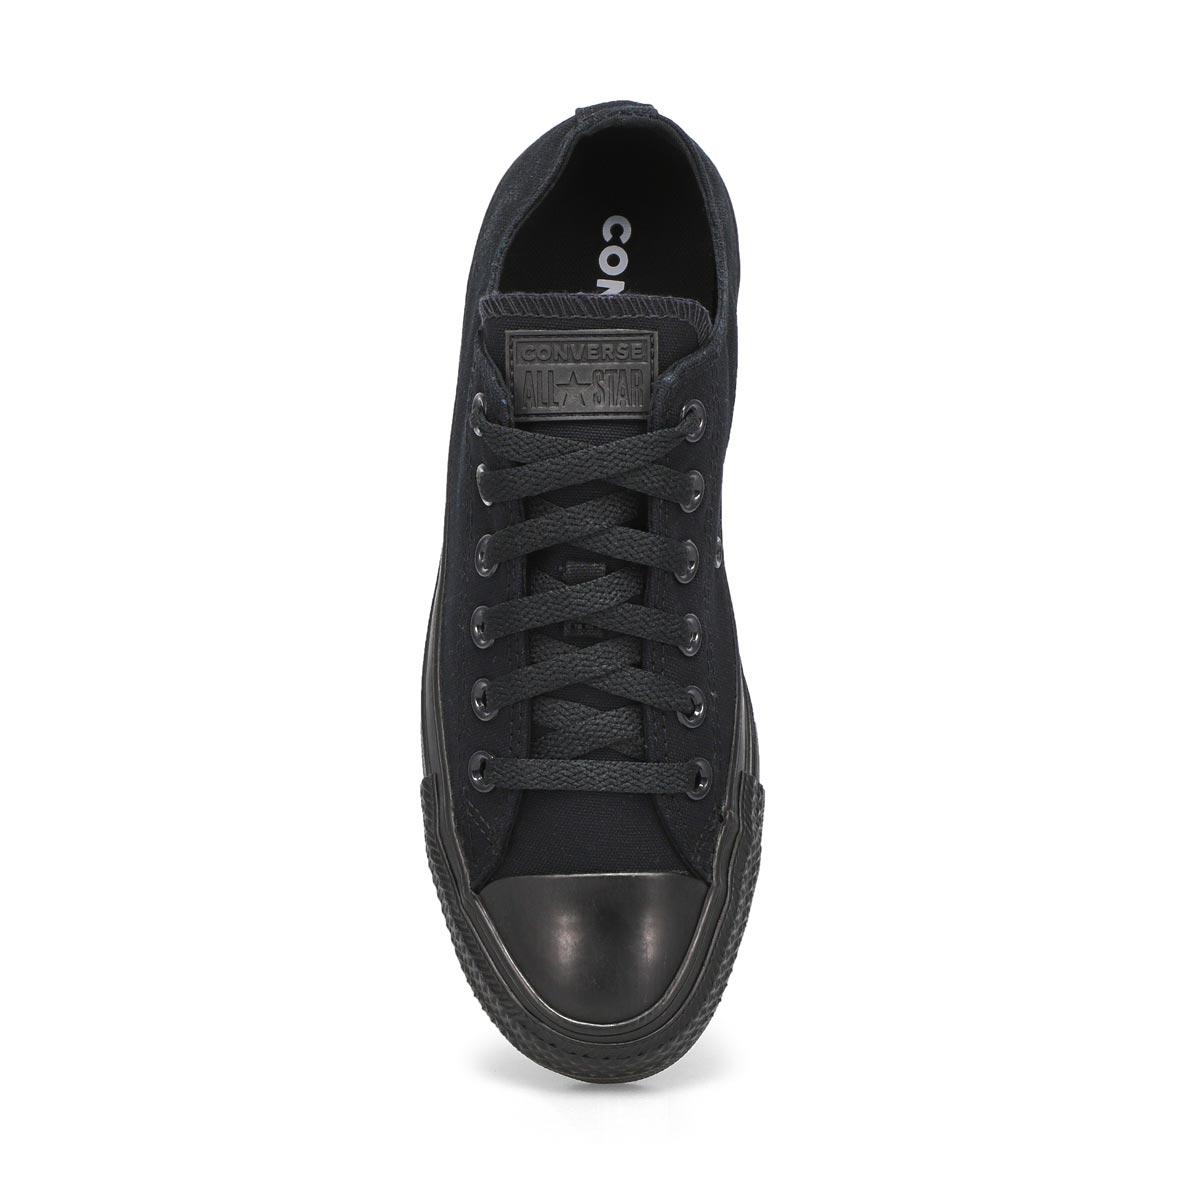 Women's Chuck Taylor All Star Sneaker - Blk Mono